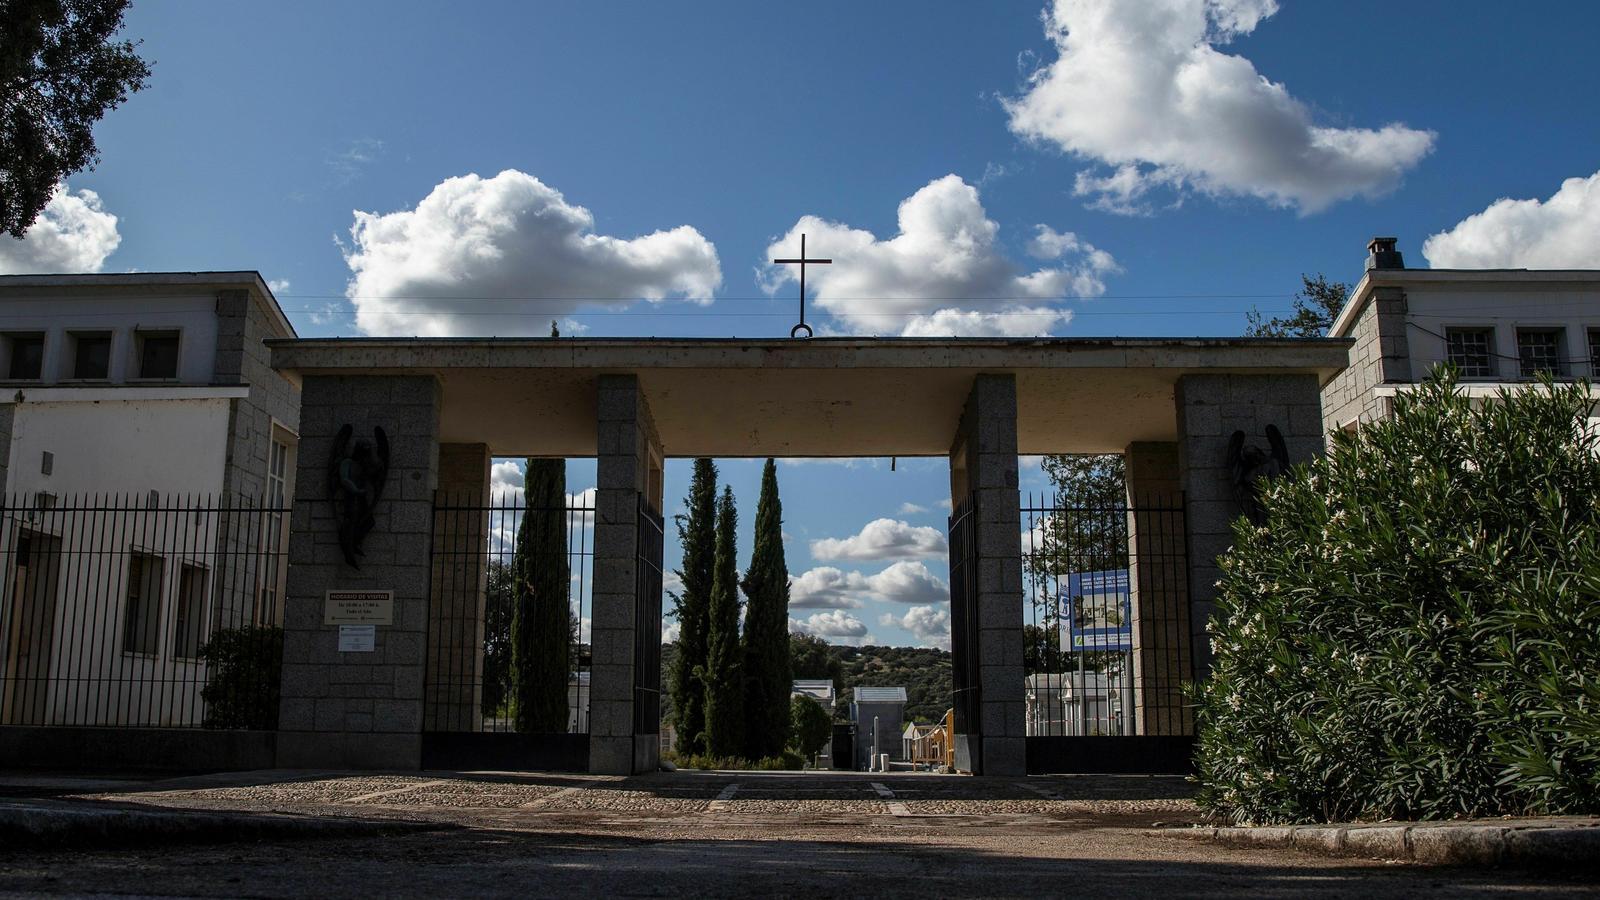 Les restes del dictador Francisco Franco seran traslladades aquest dijous al cementiri d'El Pardo-Mongorrubio, a Madrid.